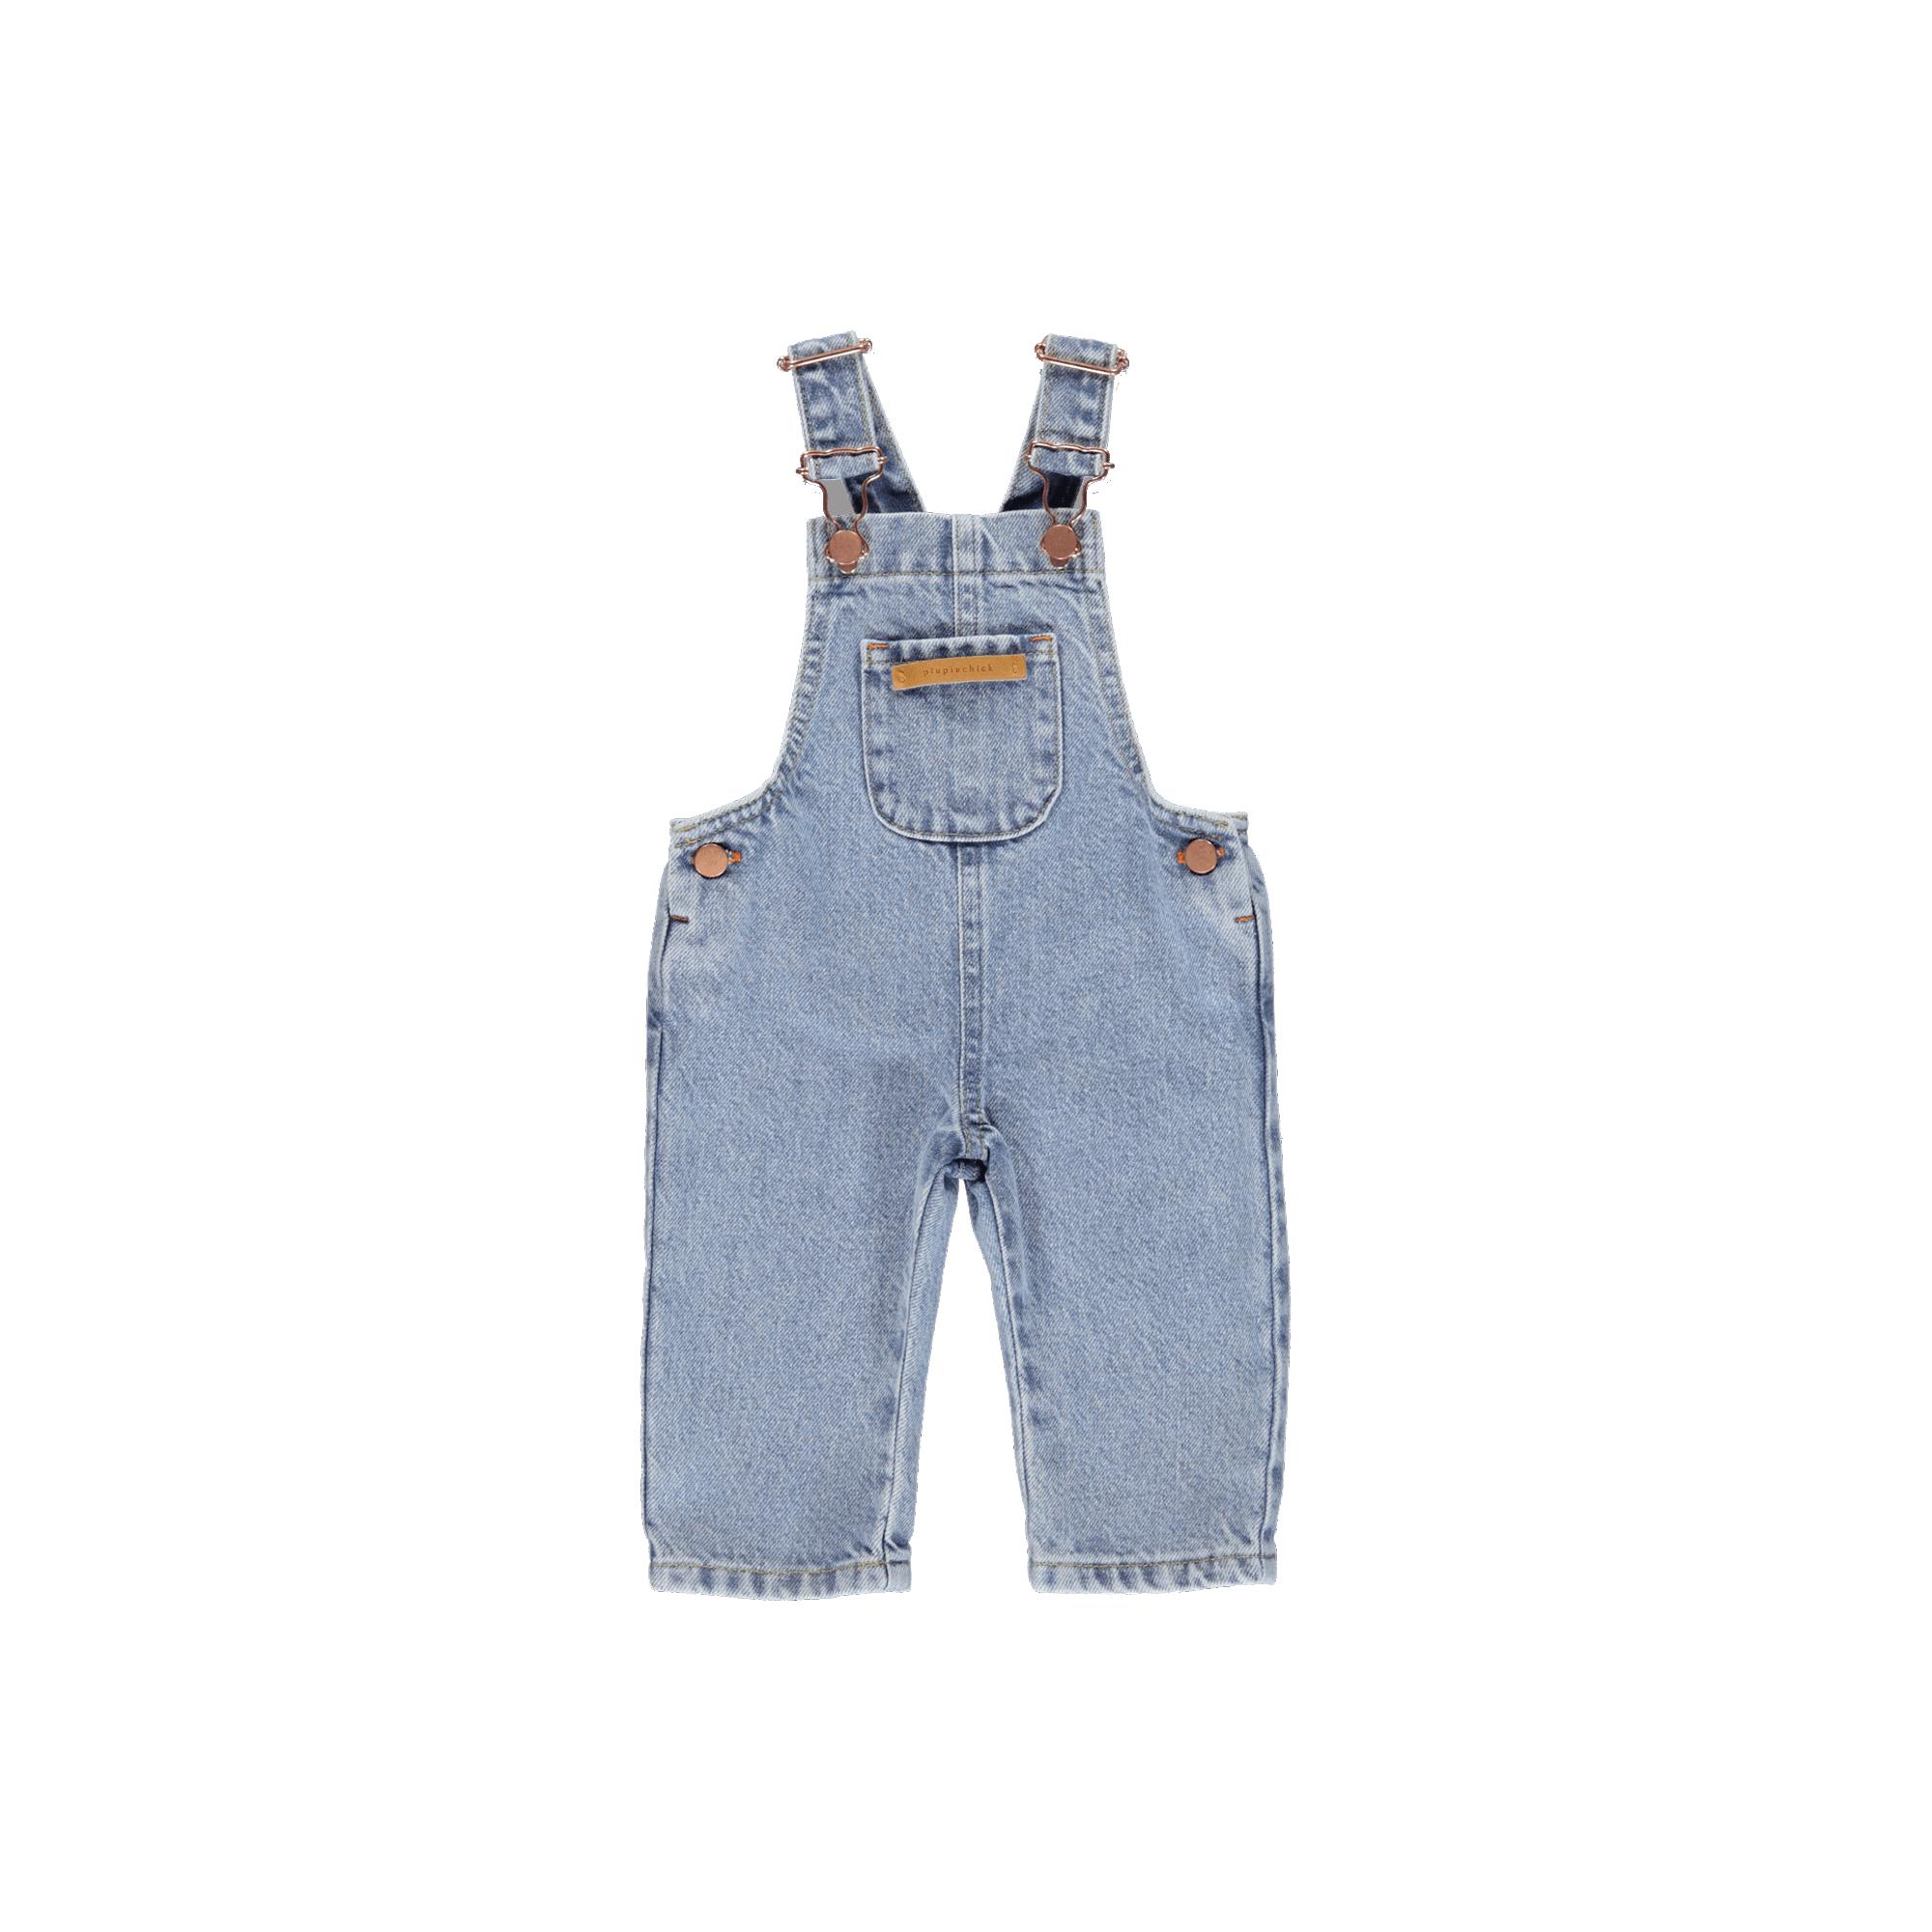 Dungarees denim jeans-1